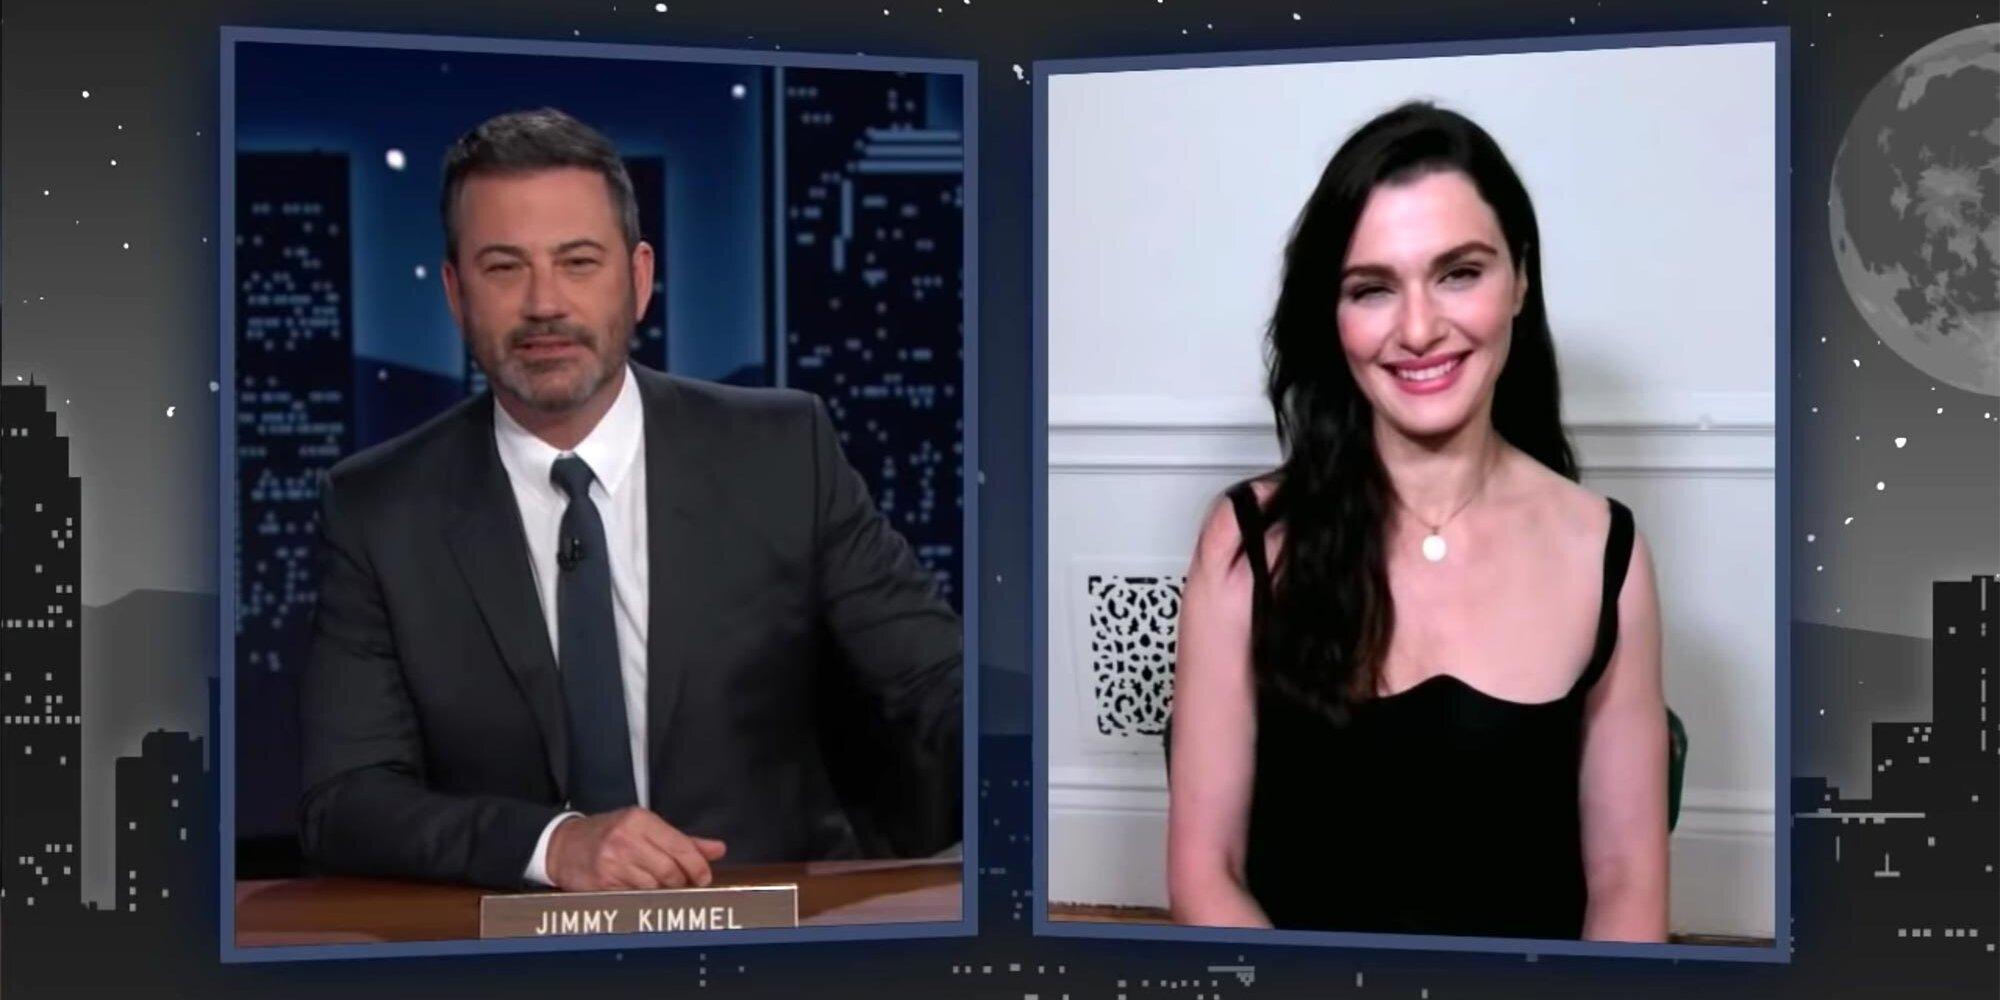 Rachel Weisz is visibly shaken after Jimmy Kimmel reveals her 'Black Widow' character's last name